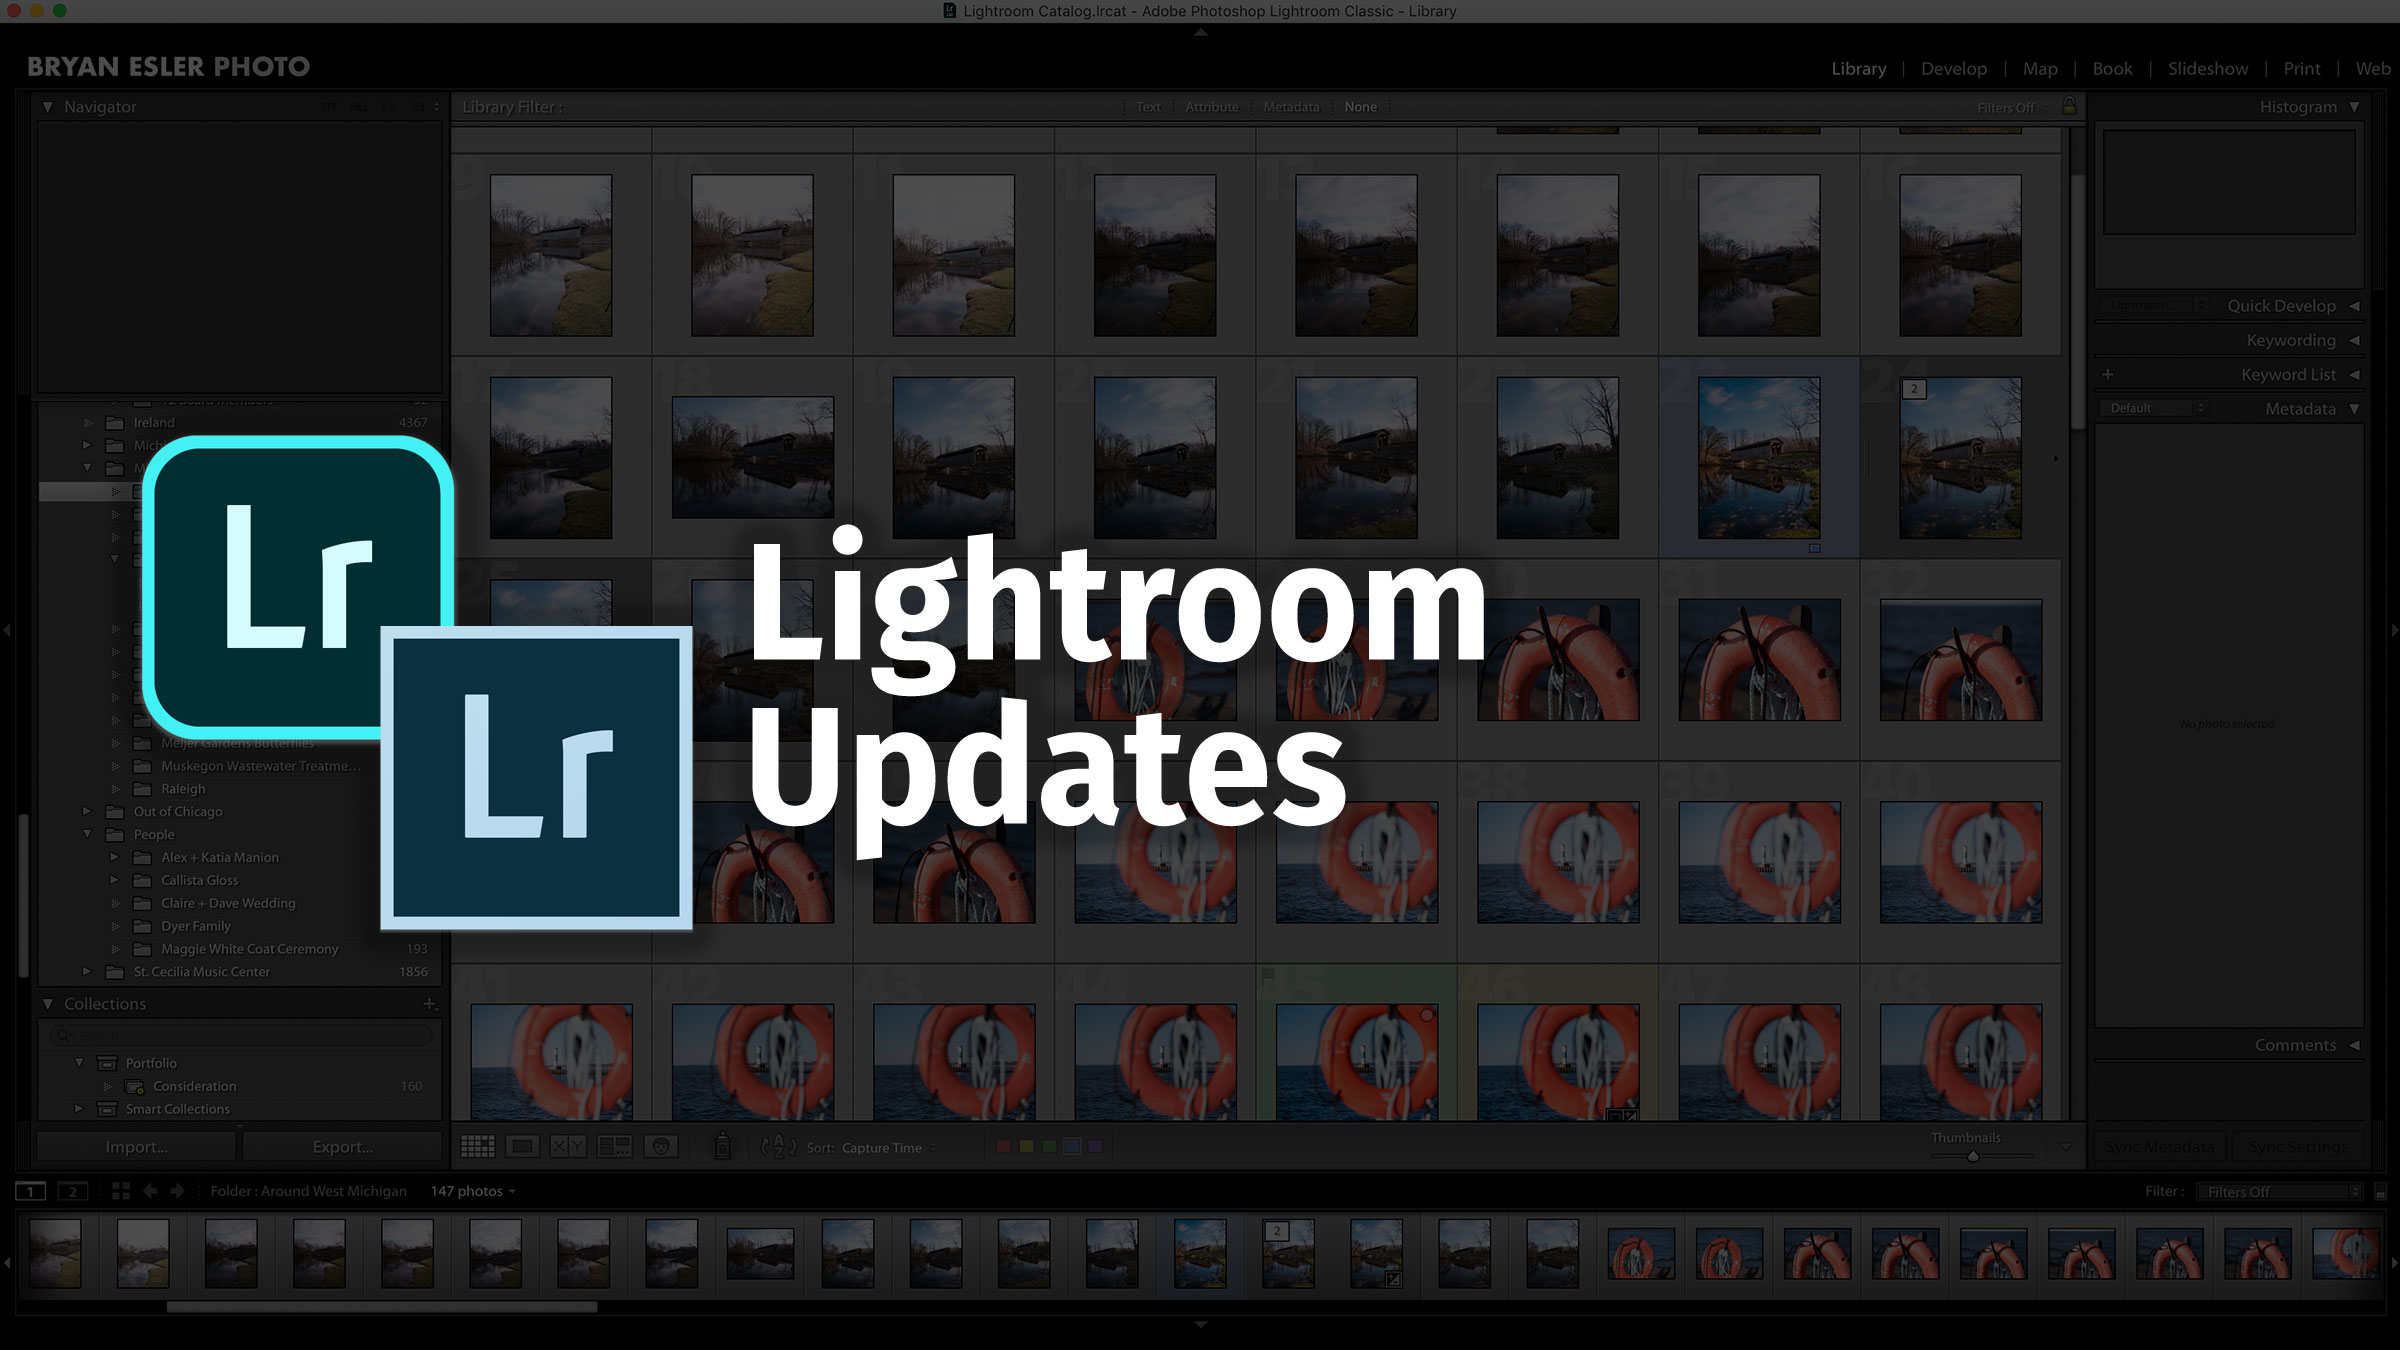 lightroom-updates-featured